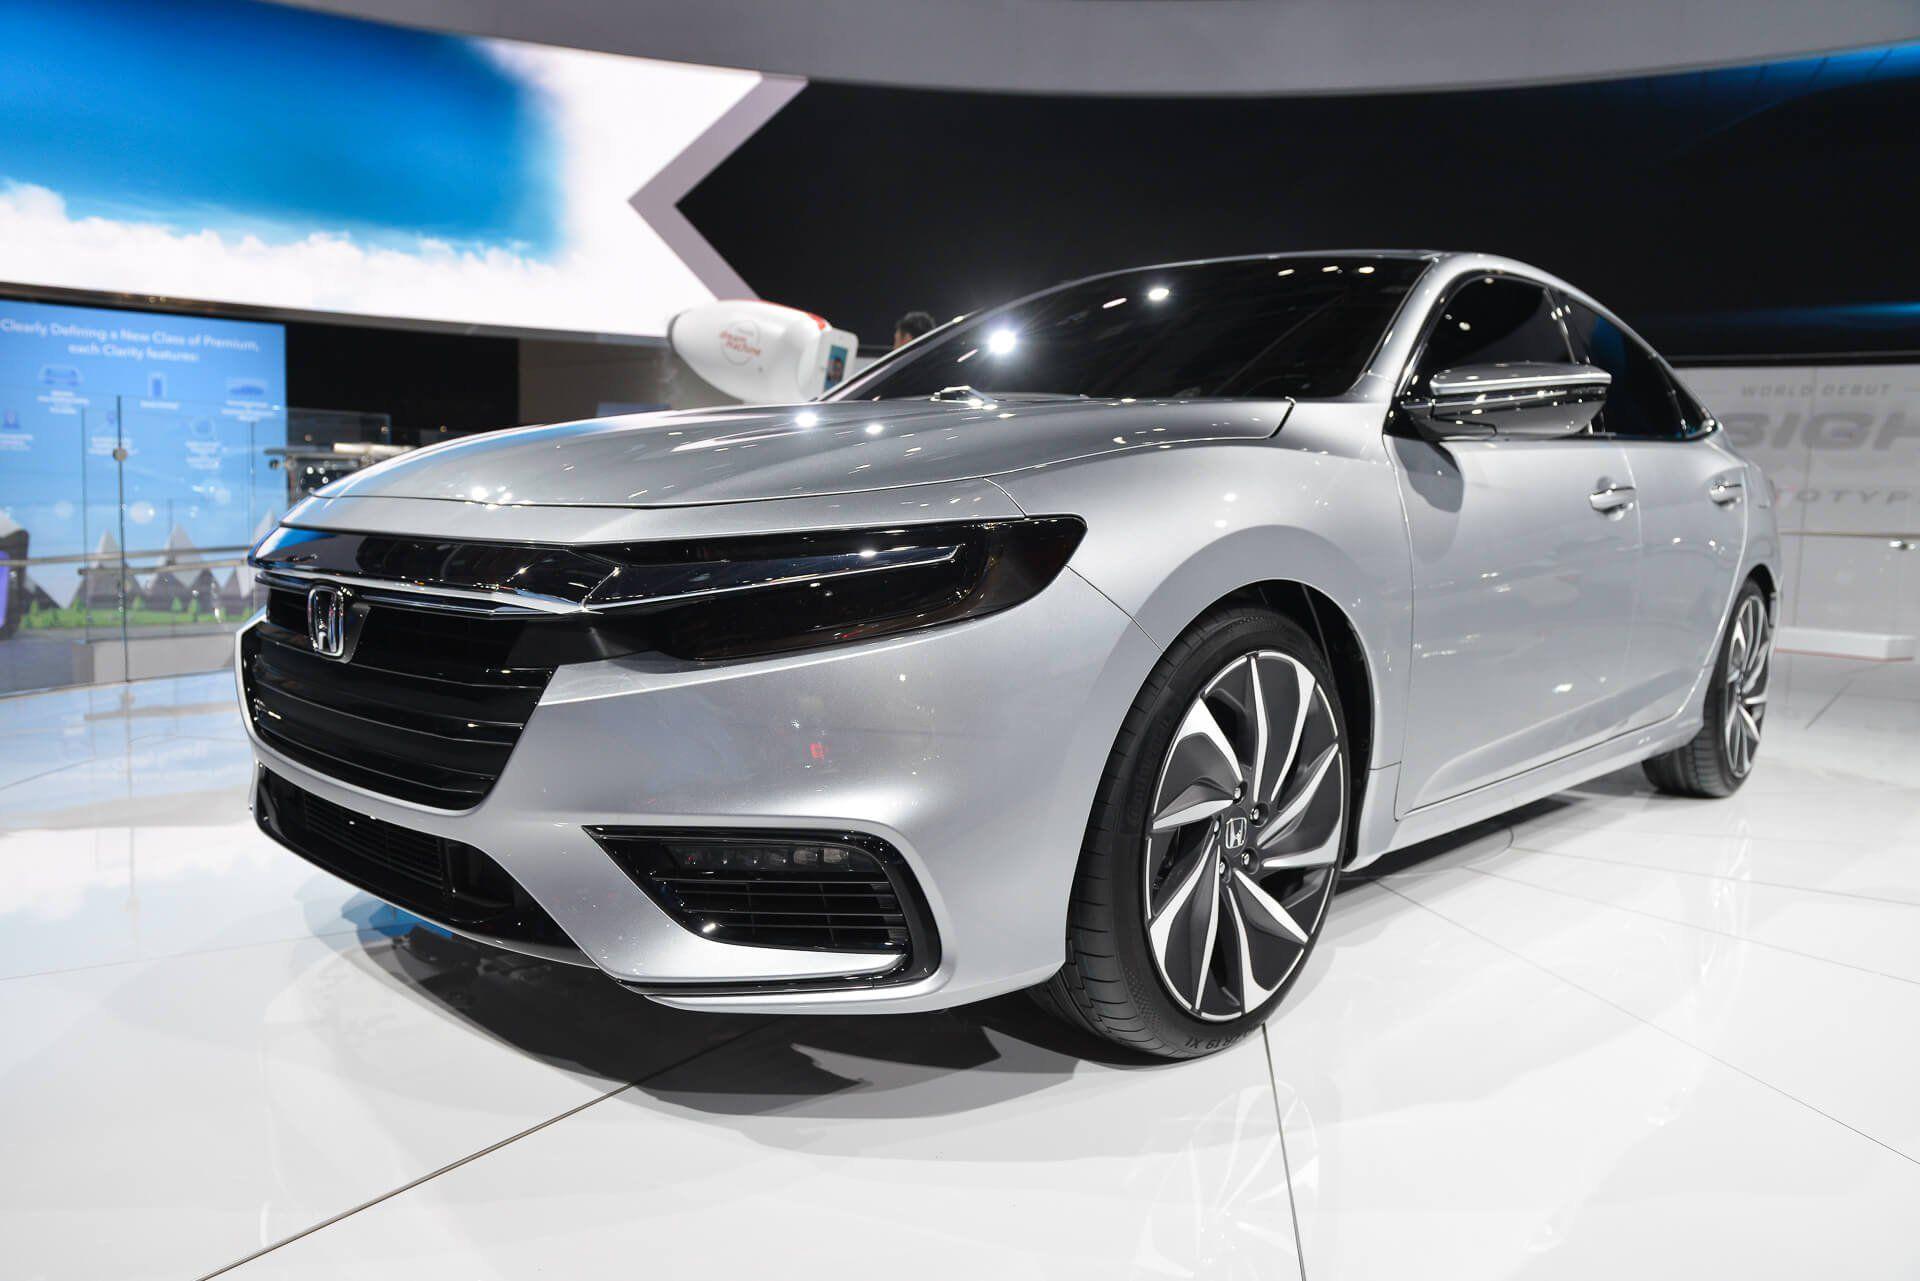 honda civic 2020 facelift model from honda sneak preview of the upcoming 2019